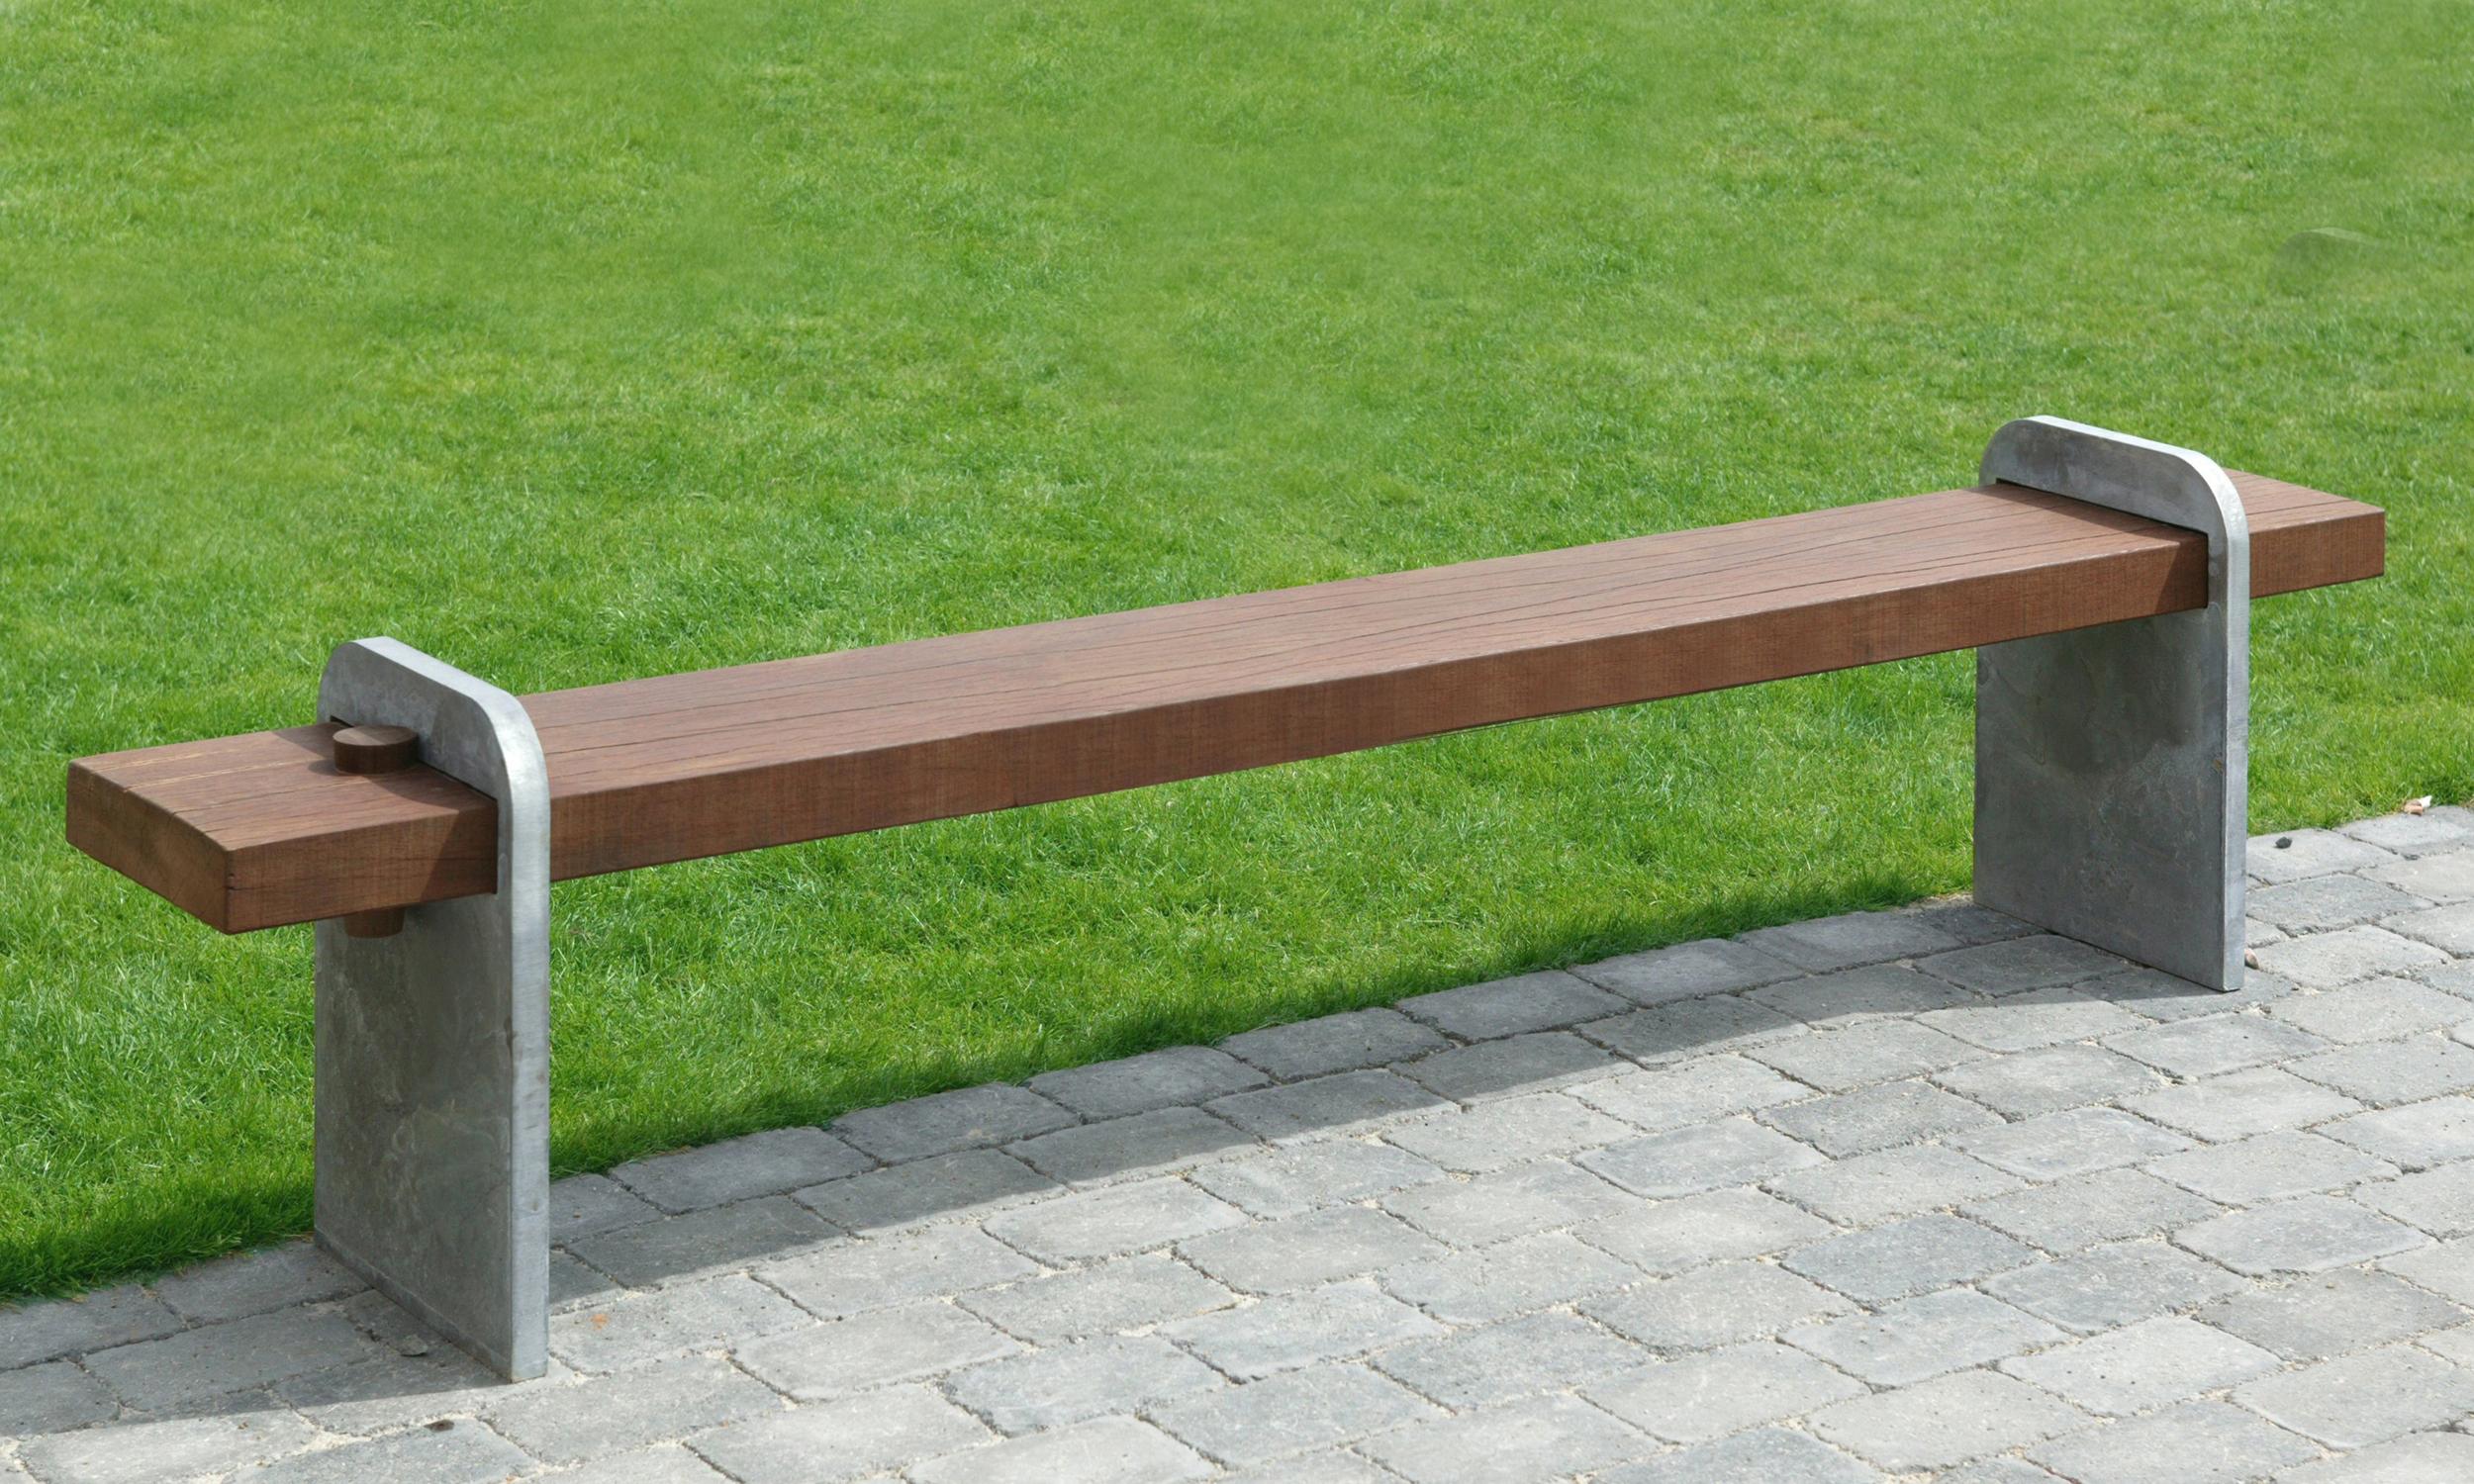 Strålende Benker og bord | Norfax SM-59